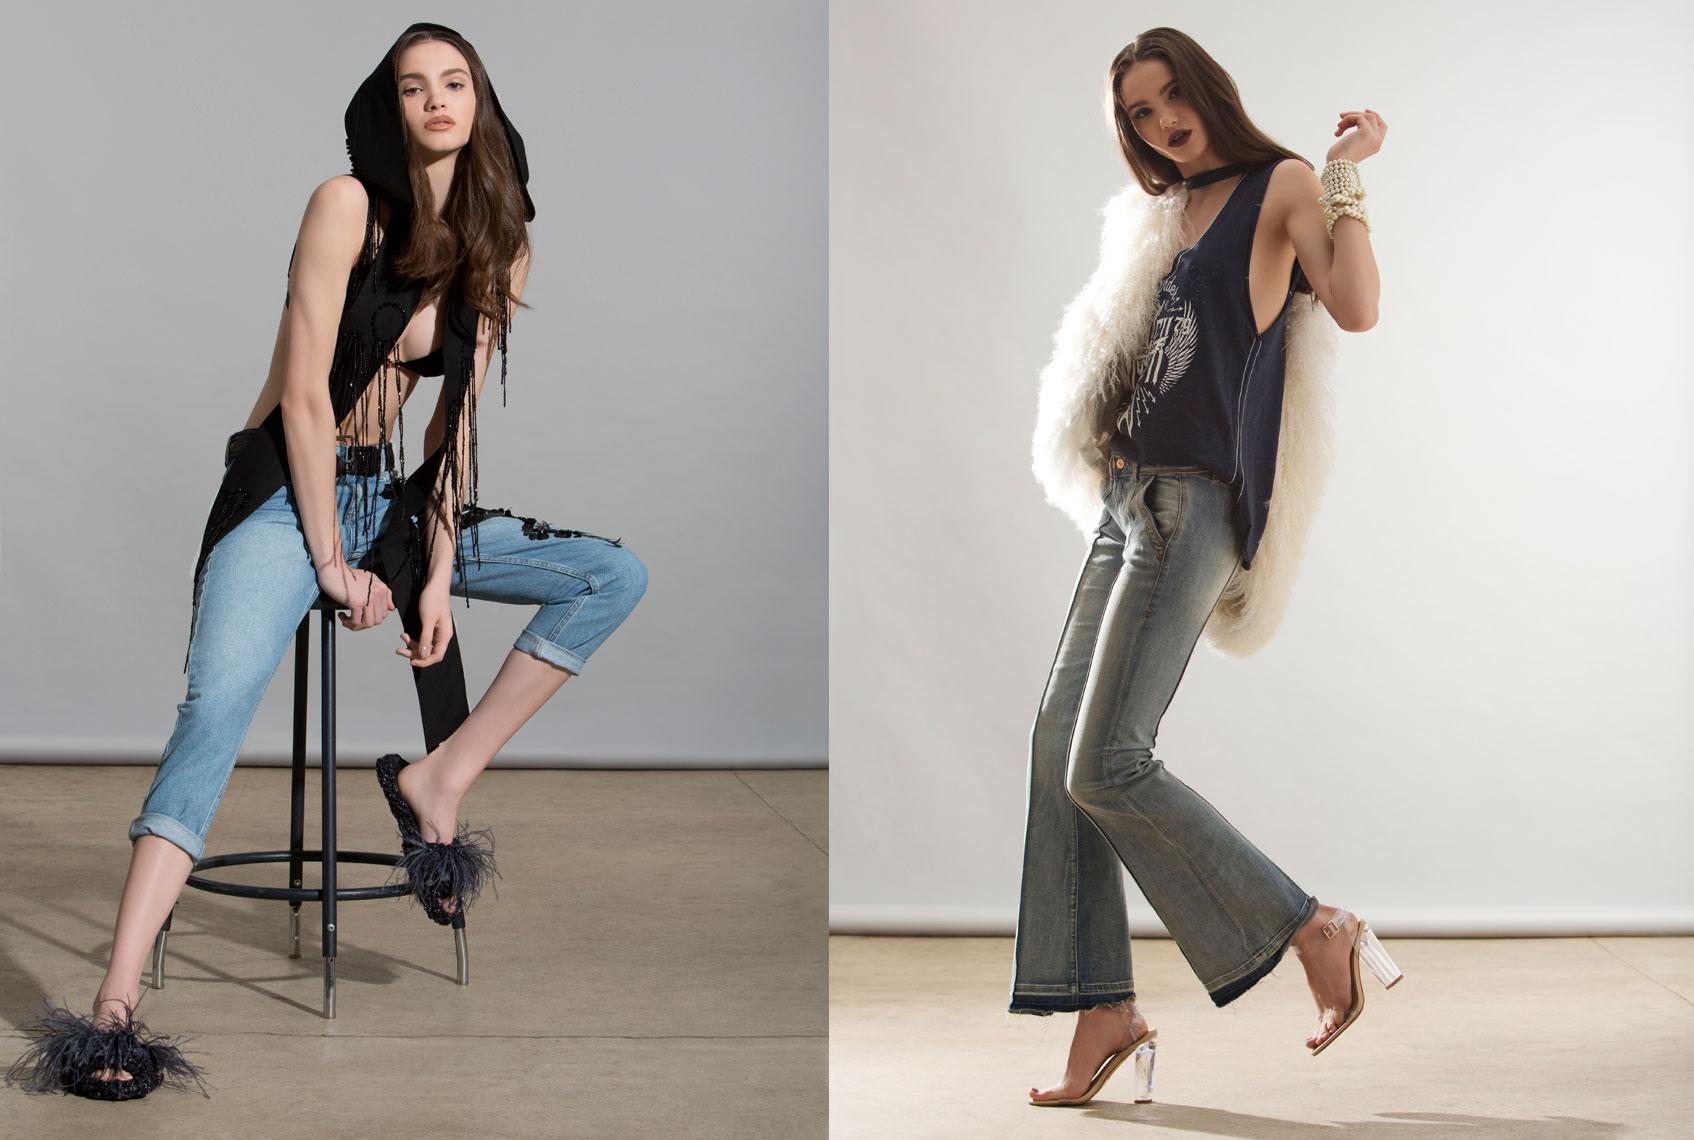 Women-Fashion-Photography-New-York-Advertising-Editorial-Catalog-Lookbooks-